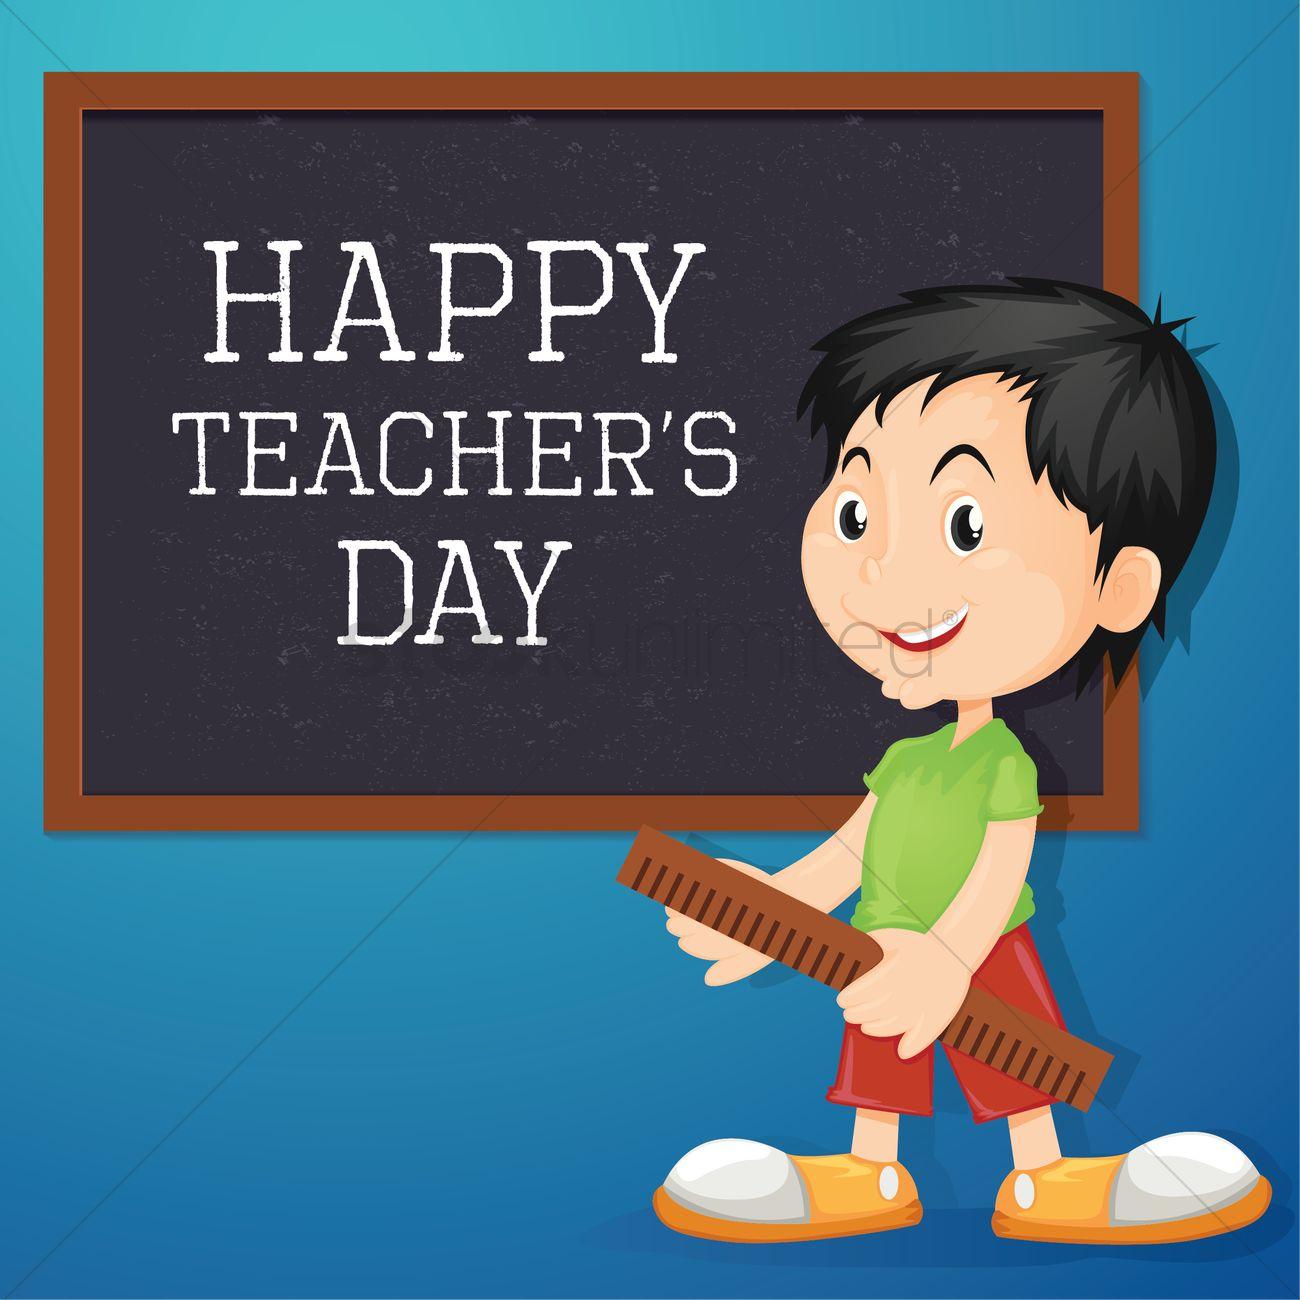 happy teacher's day design vector image  2007135